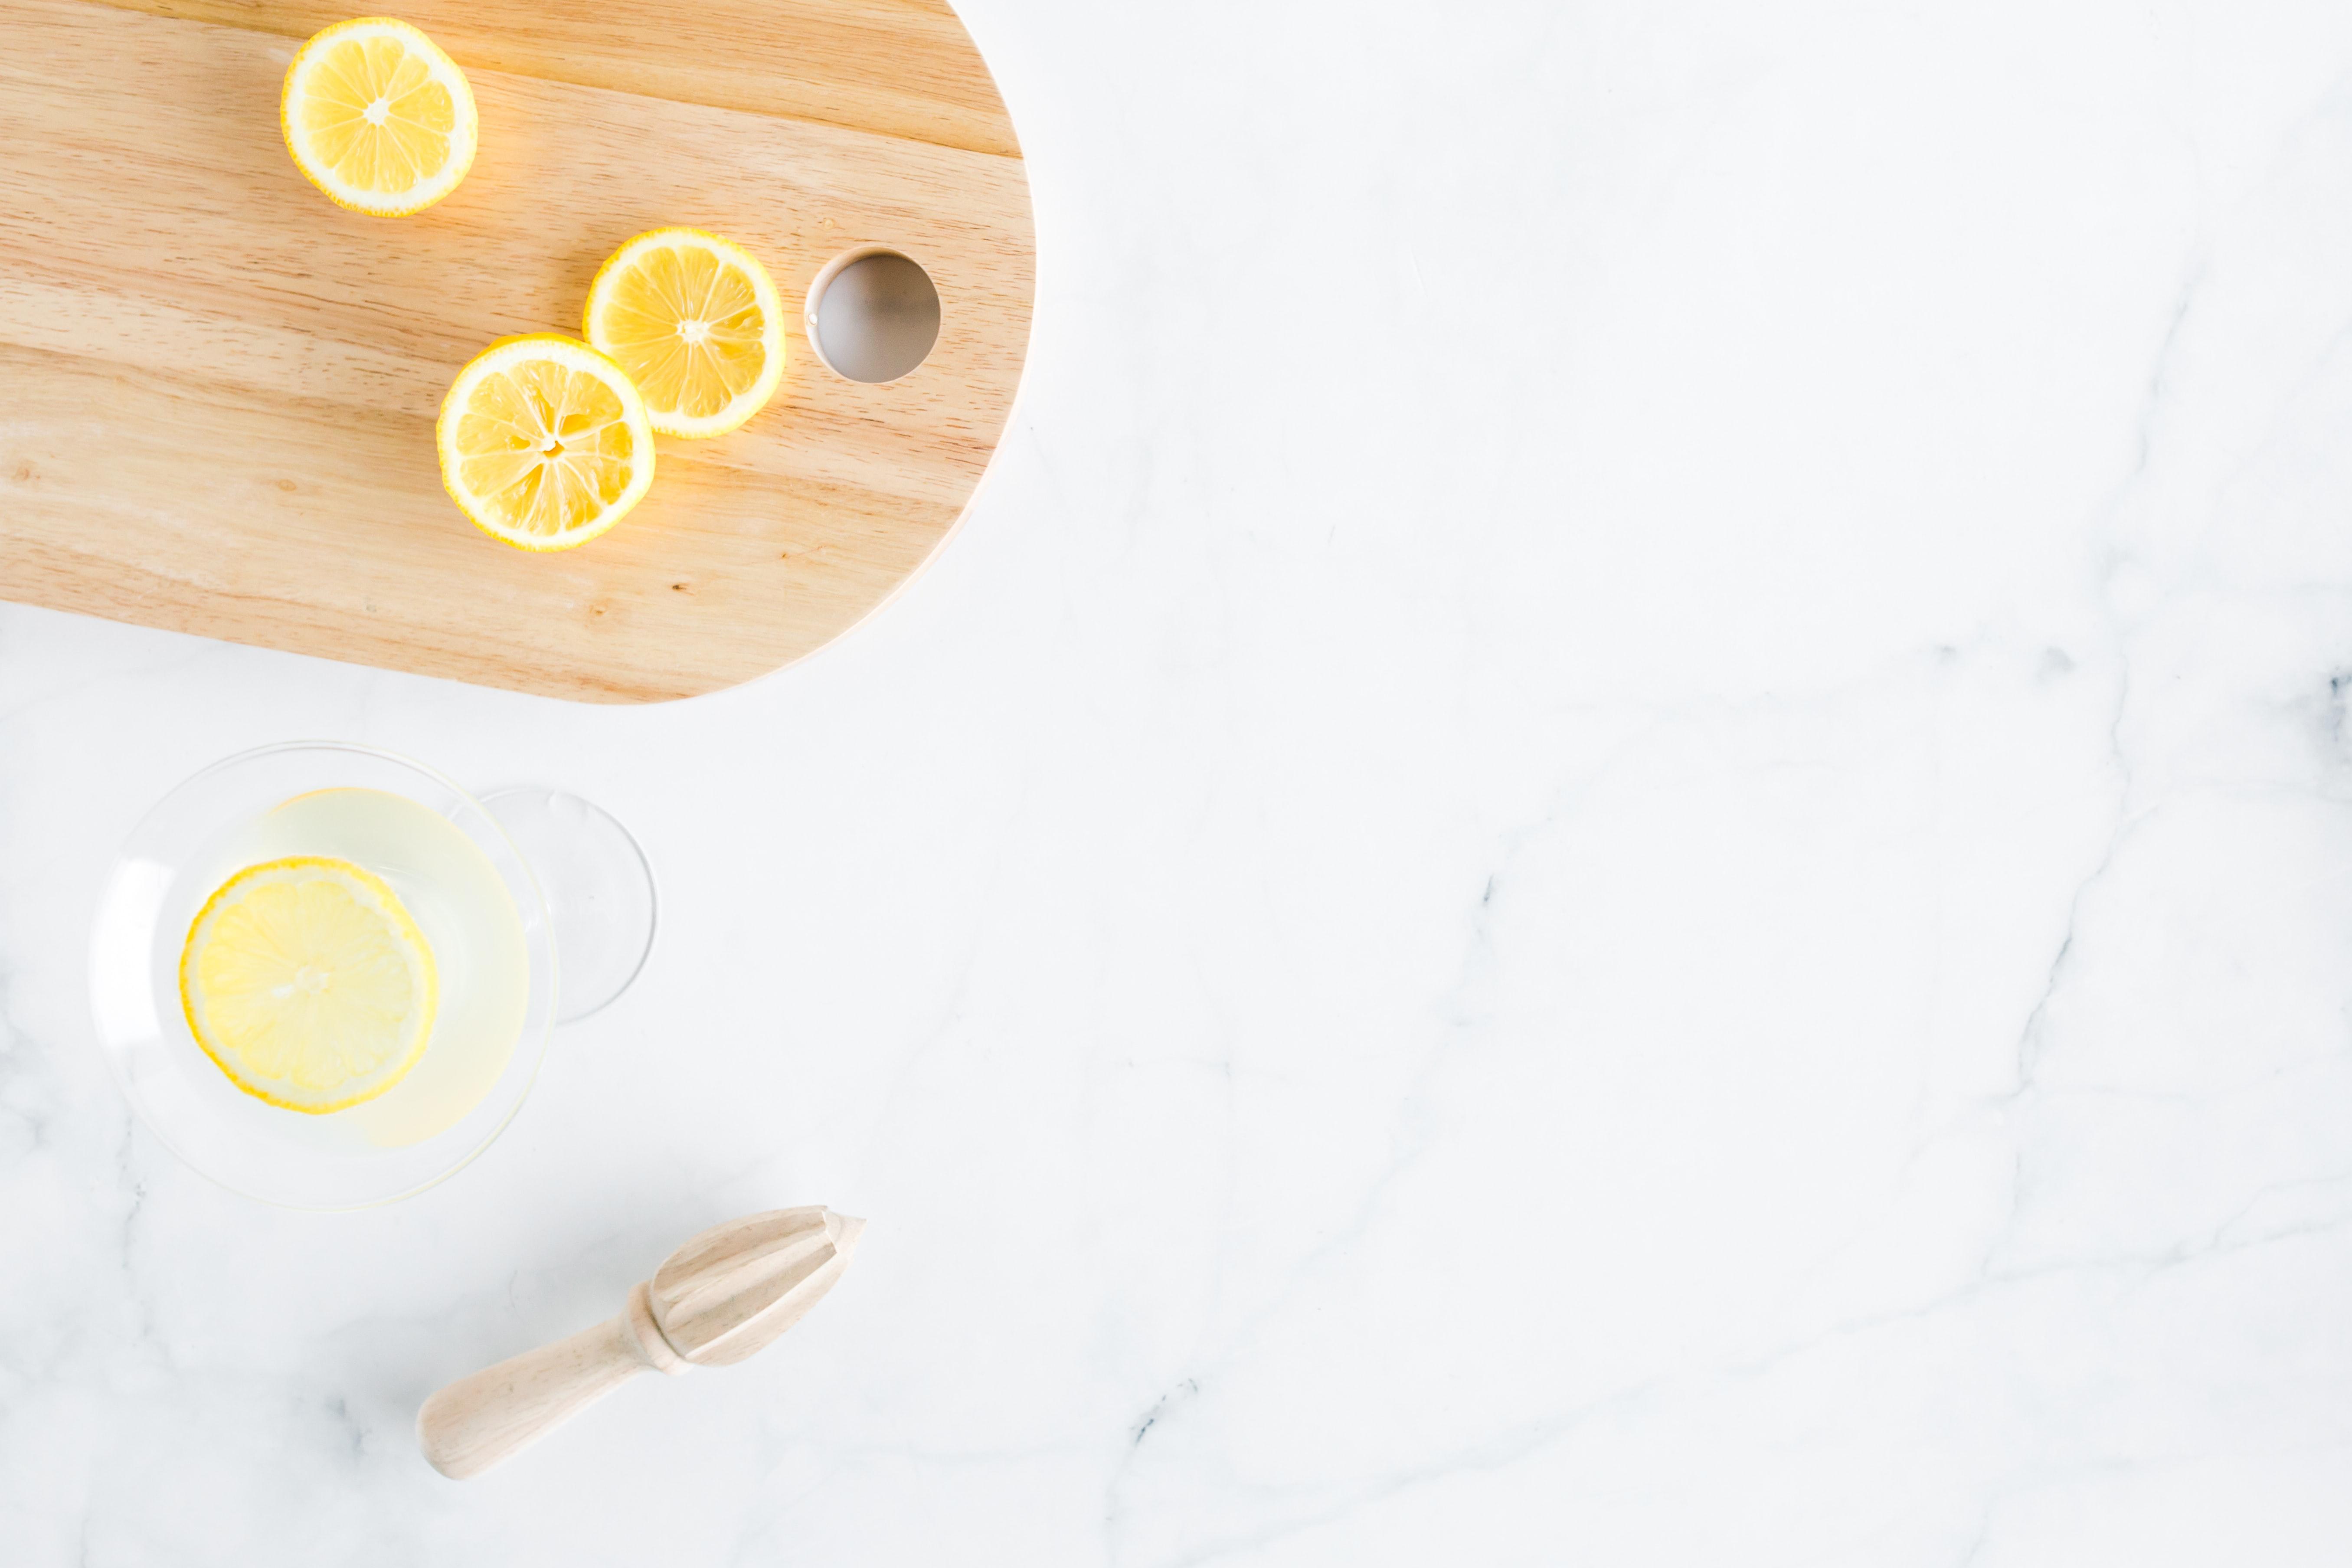 team easil z peIwEwEec unsplash #tipsandtricks: Posvetli sama svoju kosu kod kuće   limunom